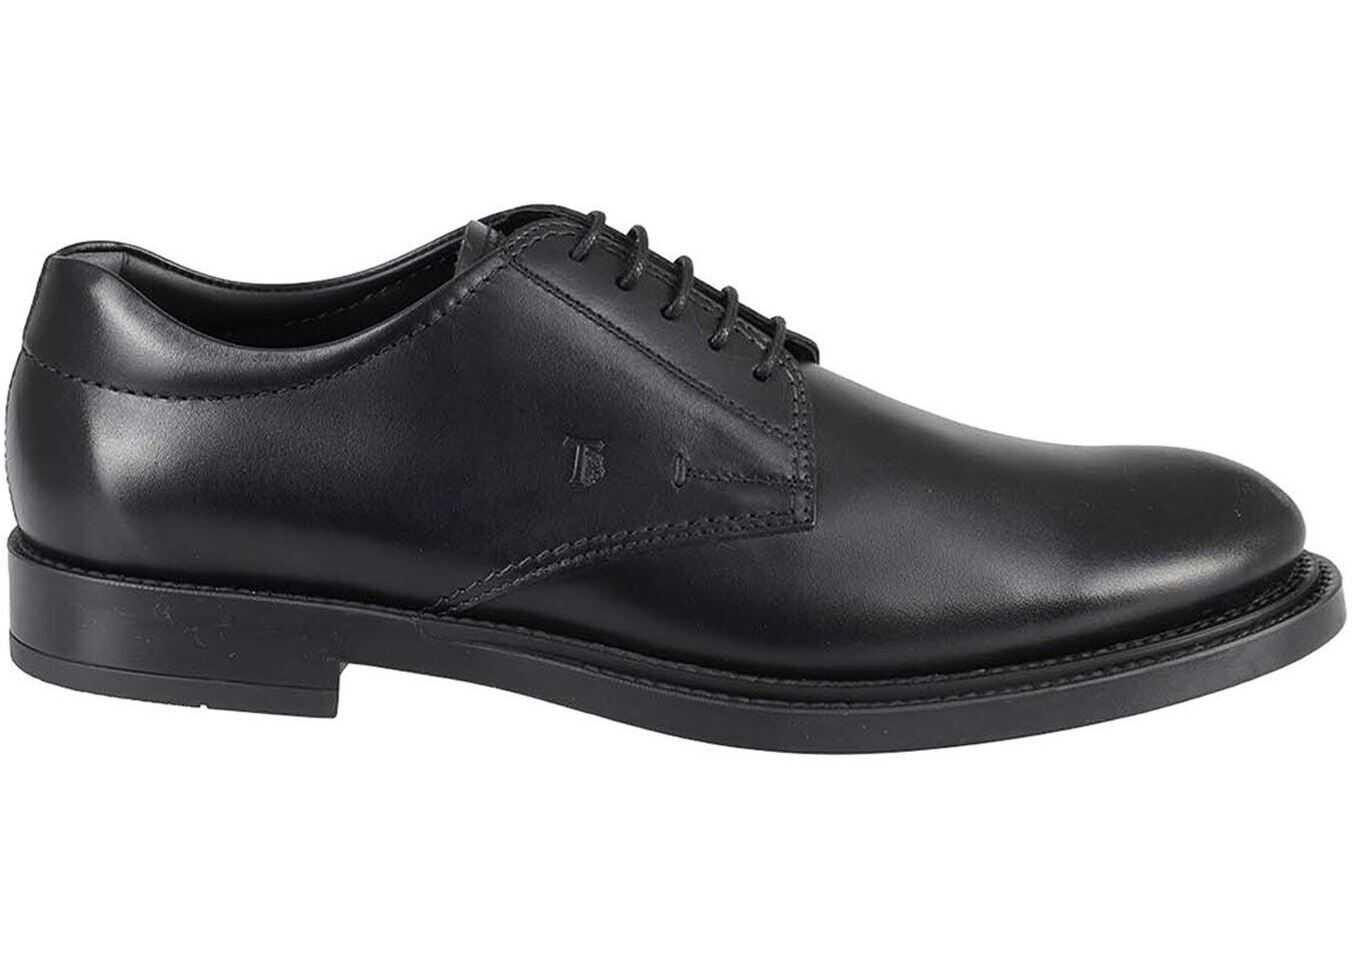 TOD'S Leather Classic Shoes In Black XXM62C00C2000LWB999 Black imagine b-mall.ro